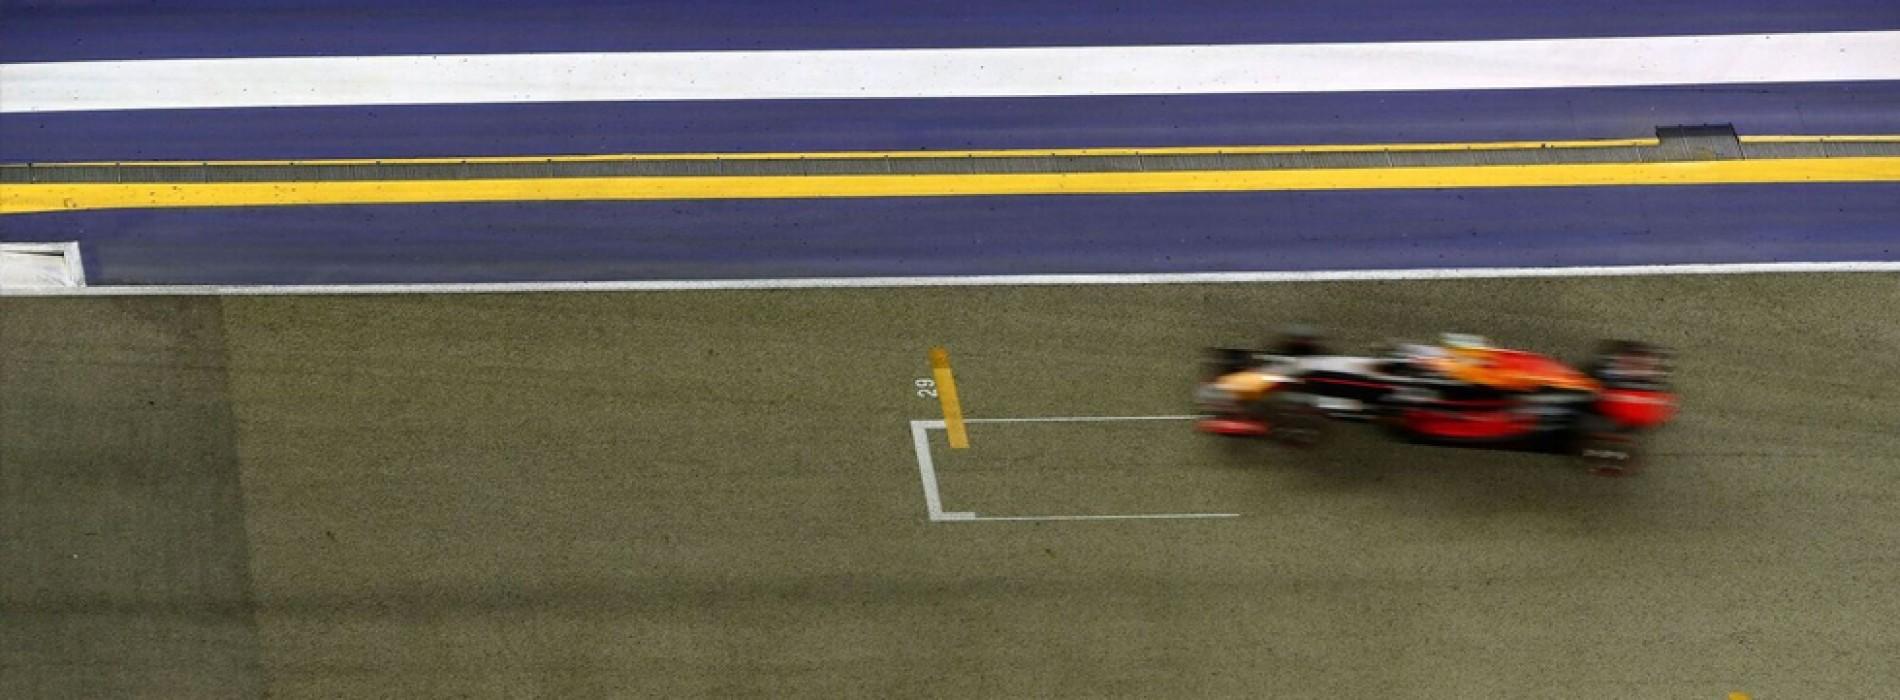 10th Edition of Grand Prix Season Singapore (GPSS)